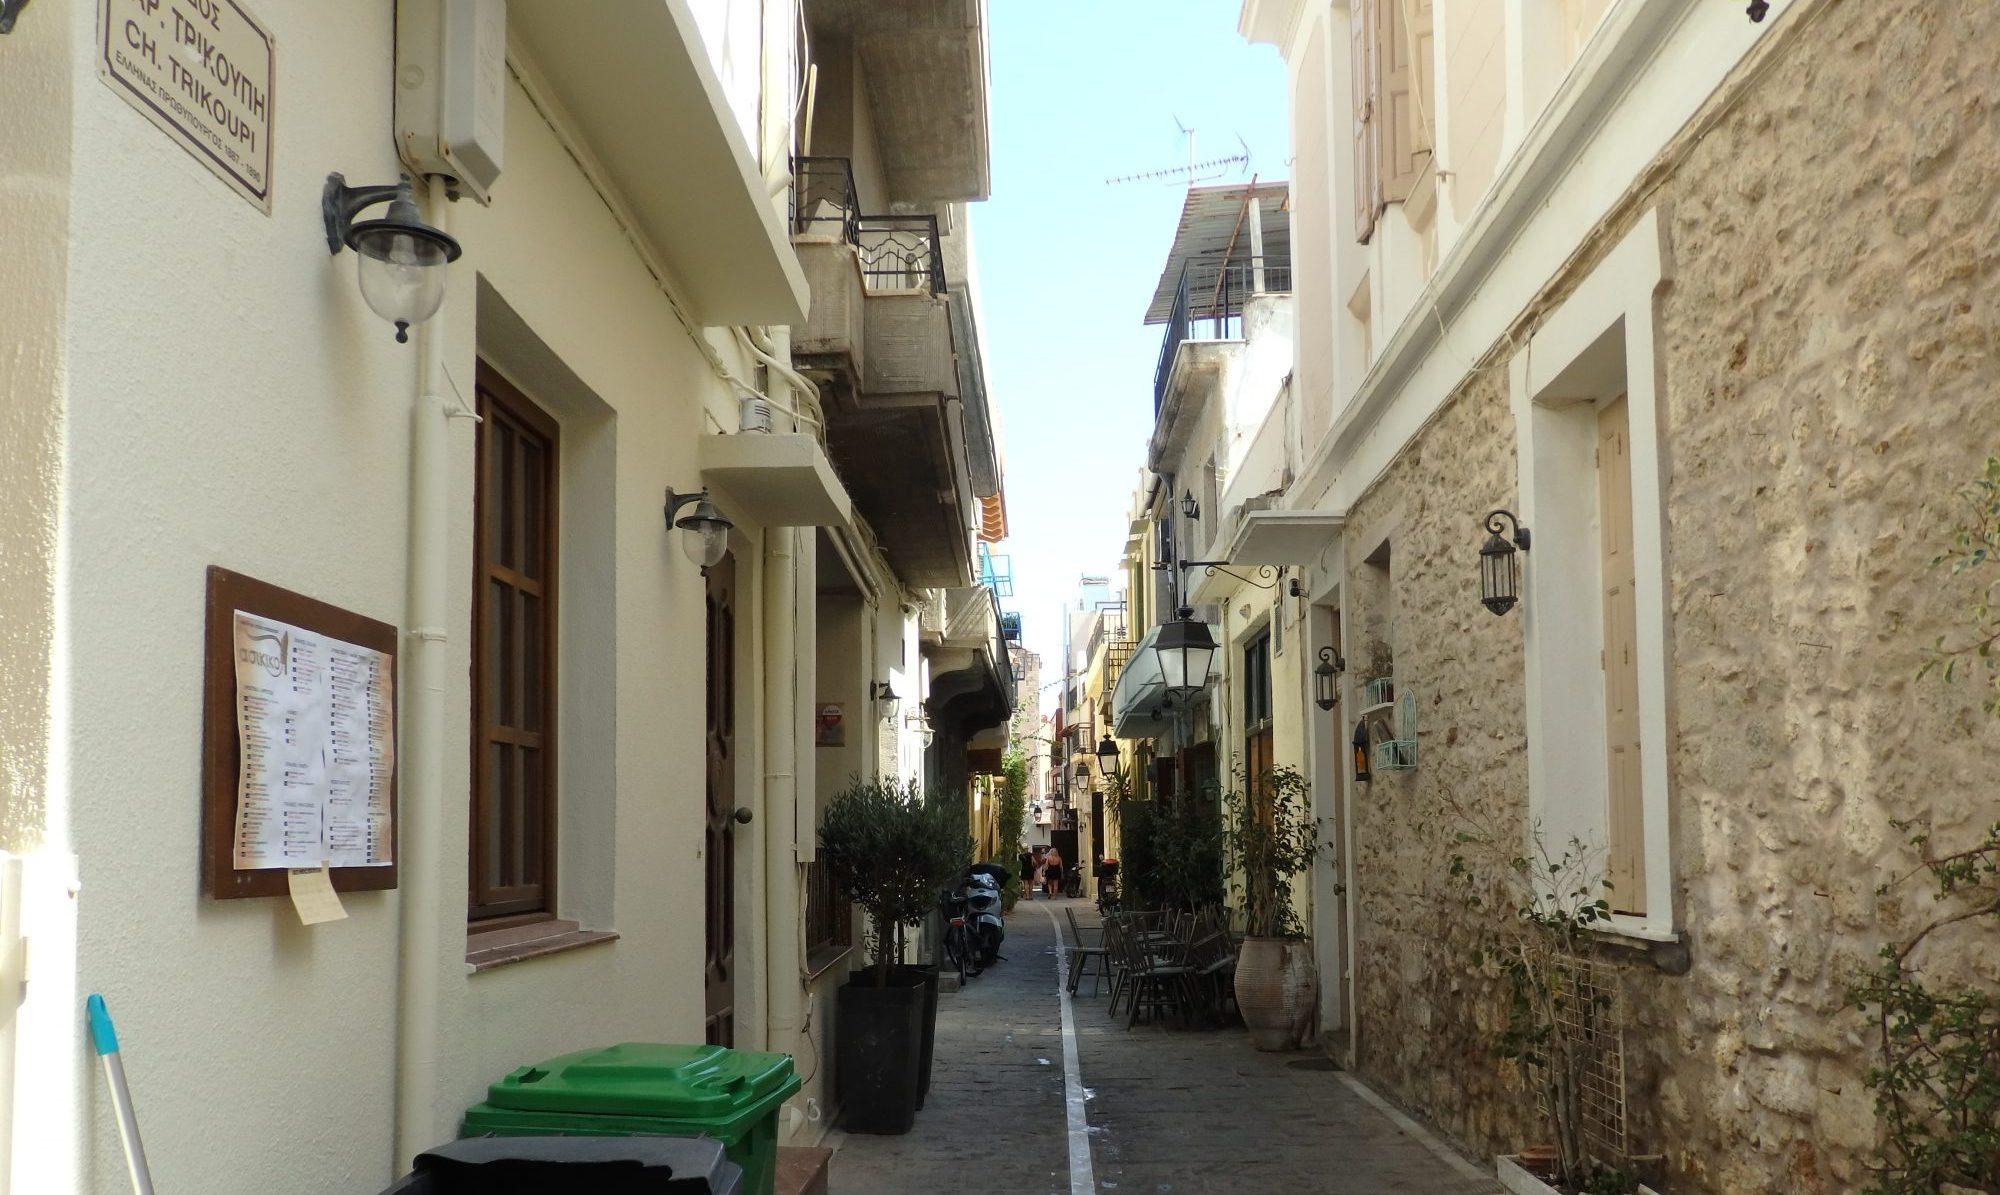 A side street in Rethymnos old center